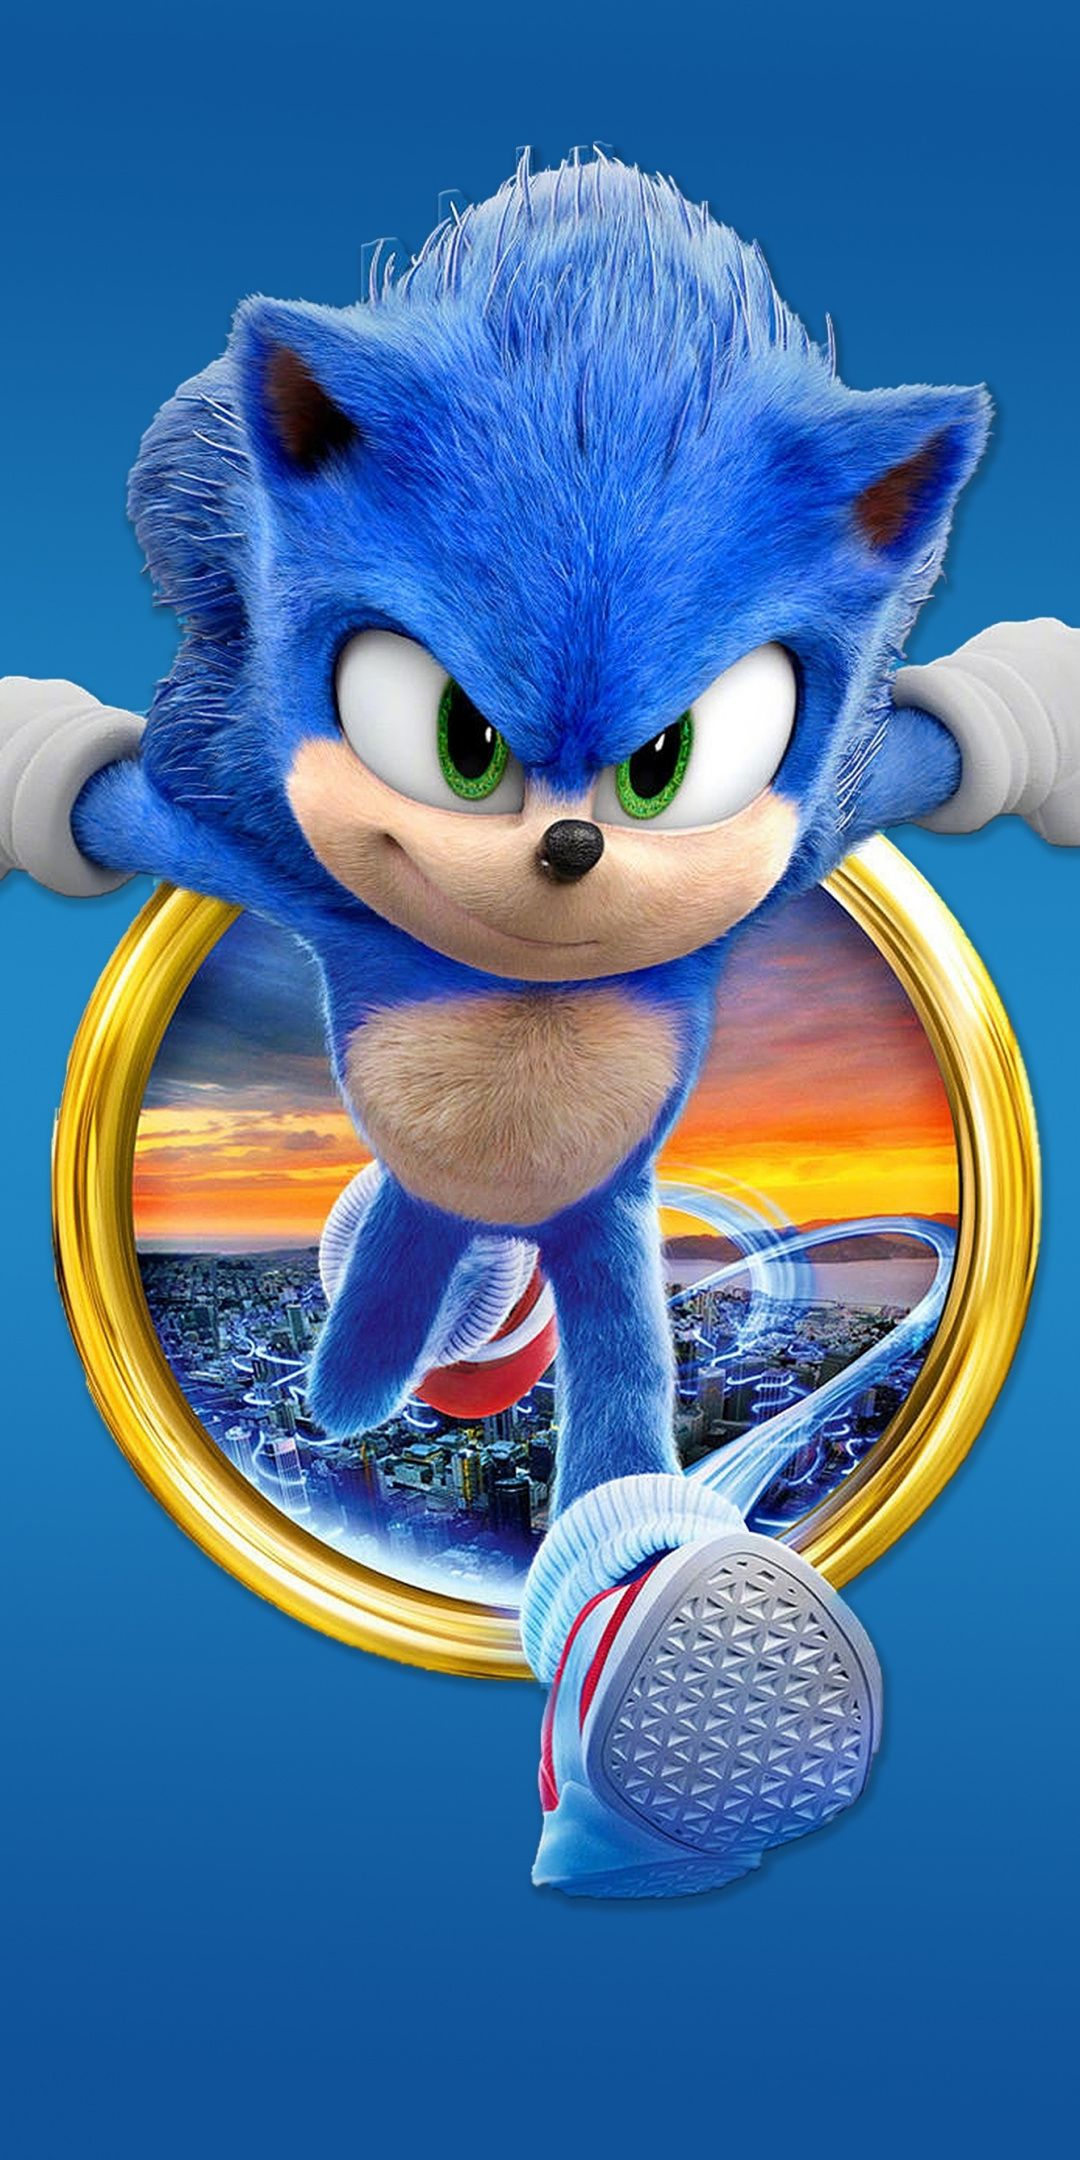 1080x2160 Movie Of 2020 Sonic Wallpaper En 2020 Arte Erizo Sonic Fotos Fiestas De Cumpleanos De Sonic